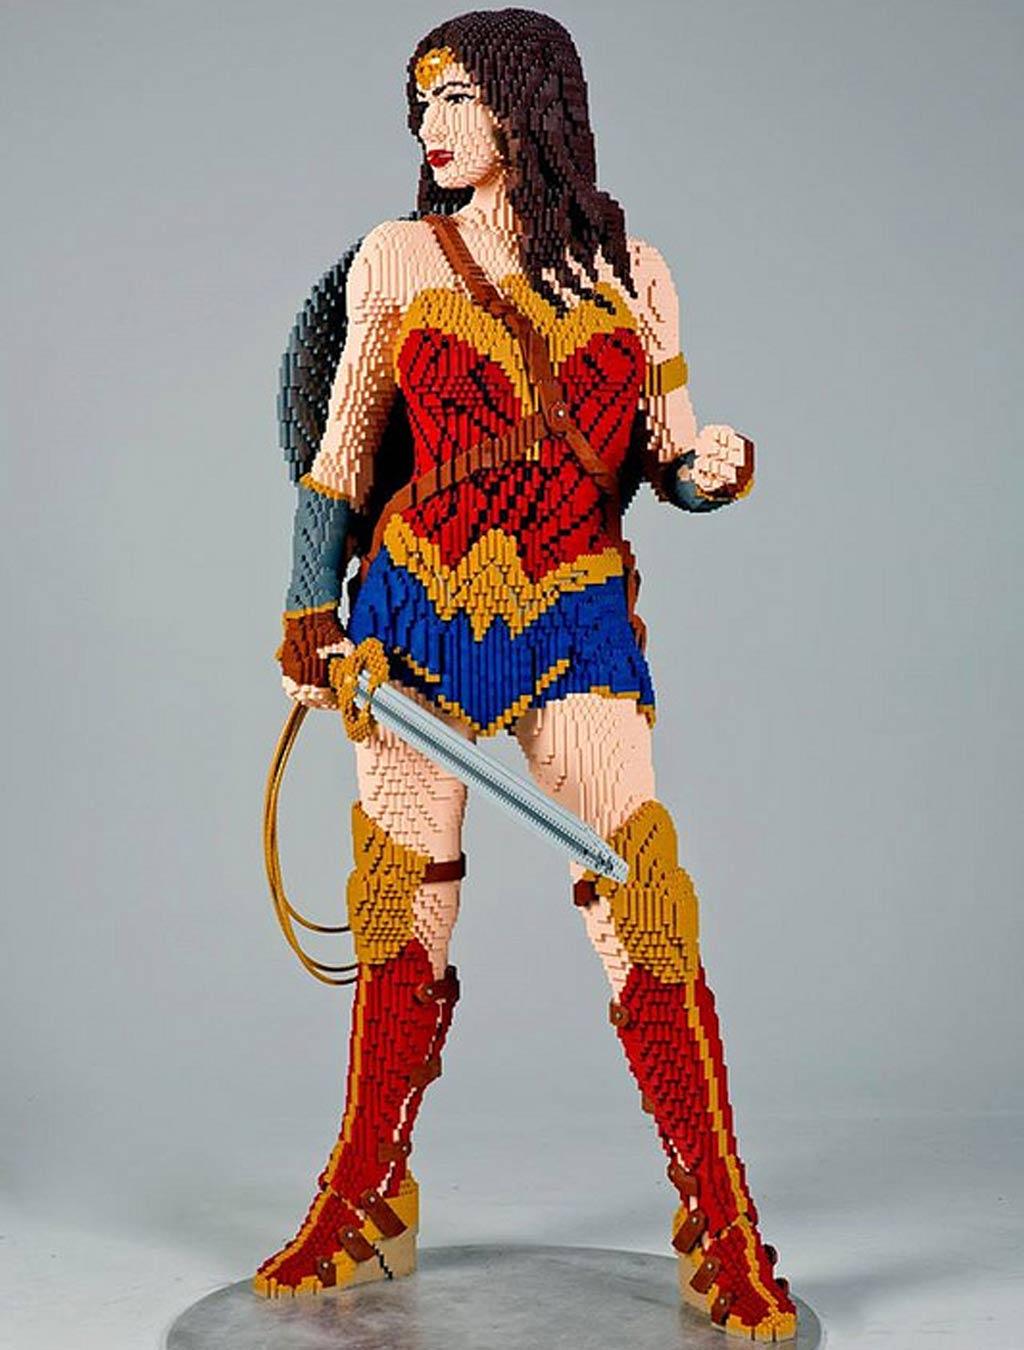 Steinige Wonder Woman | © LEGO Group